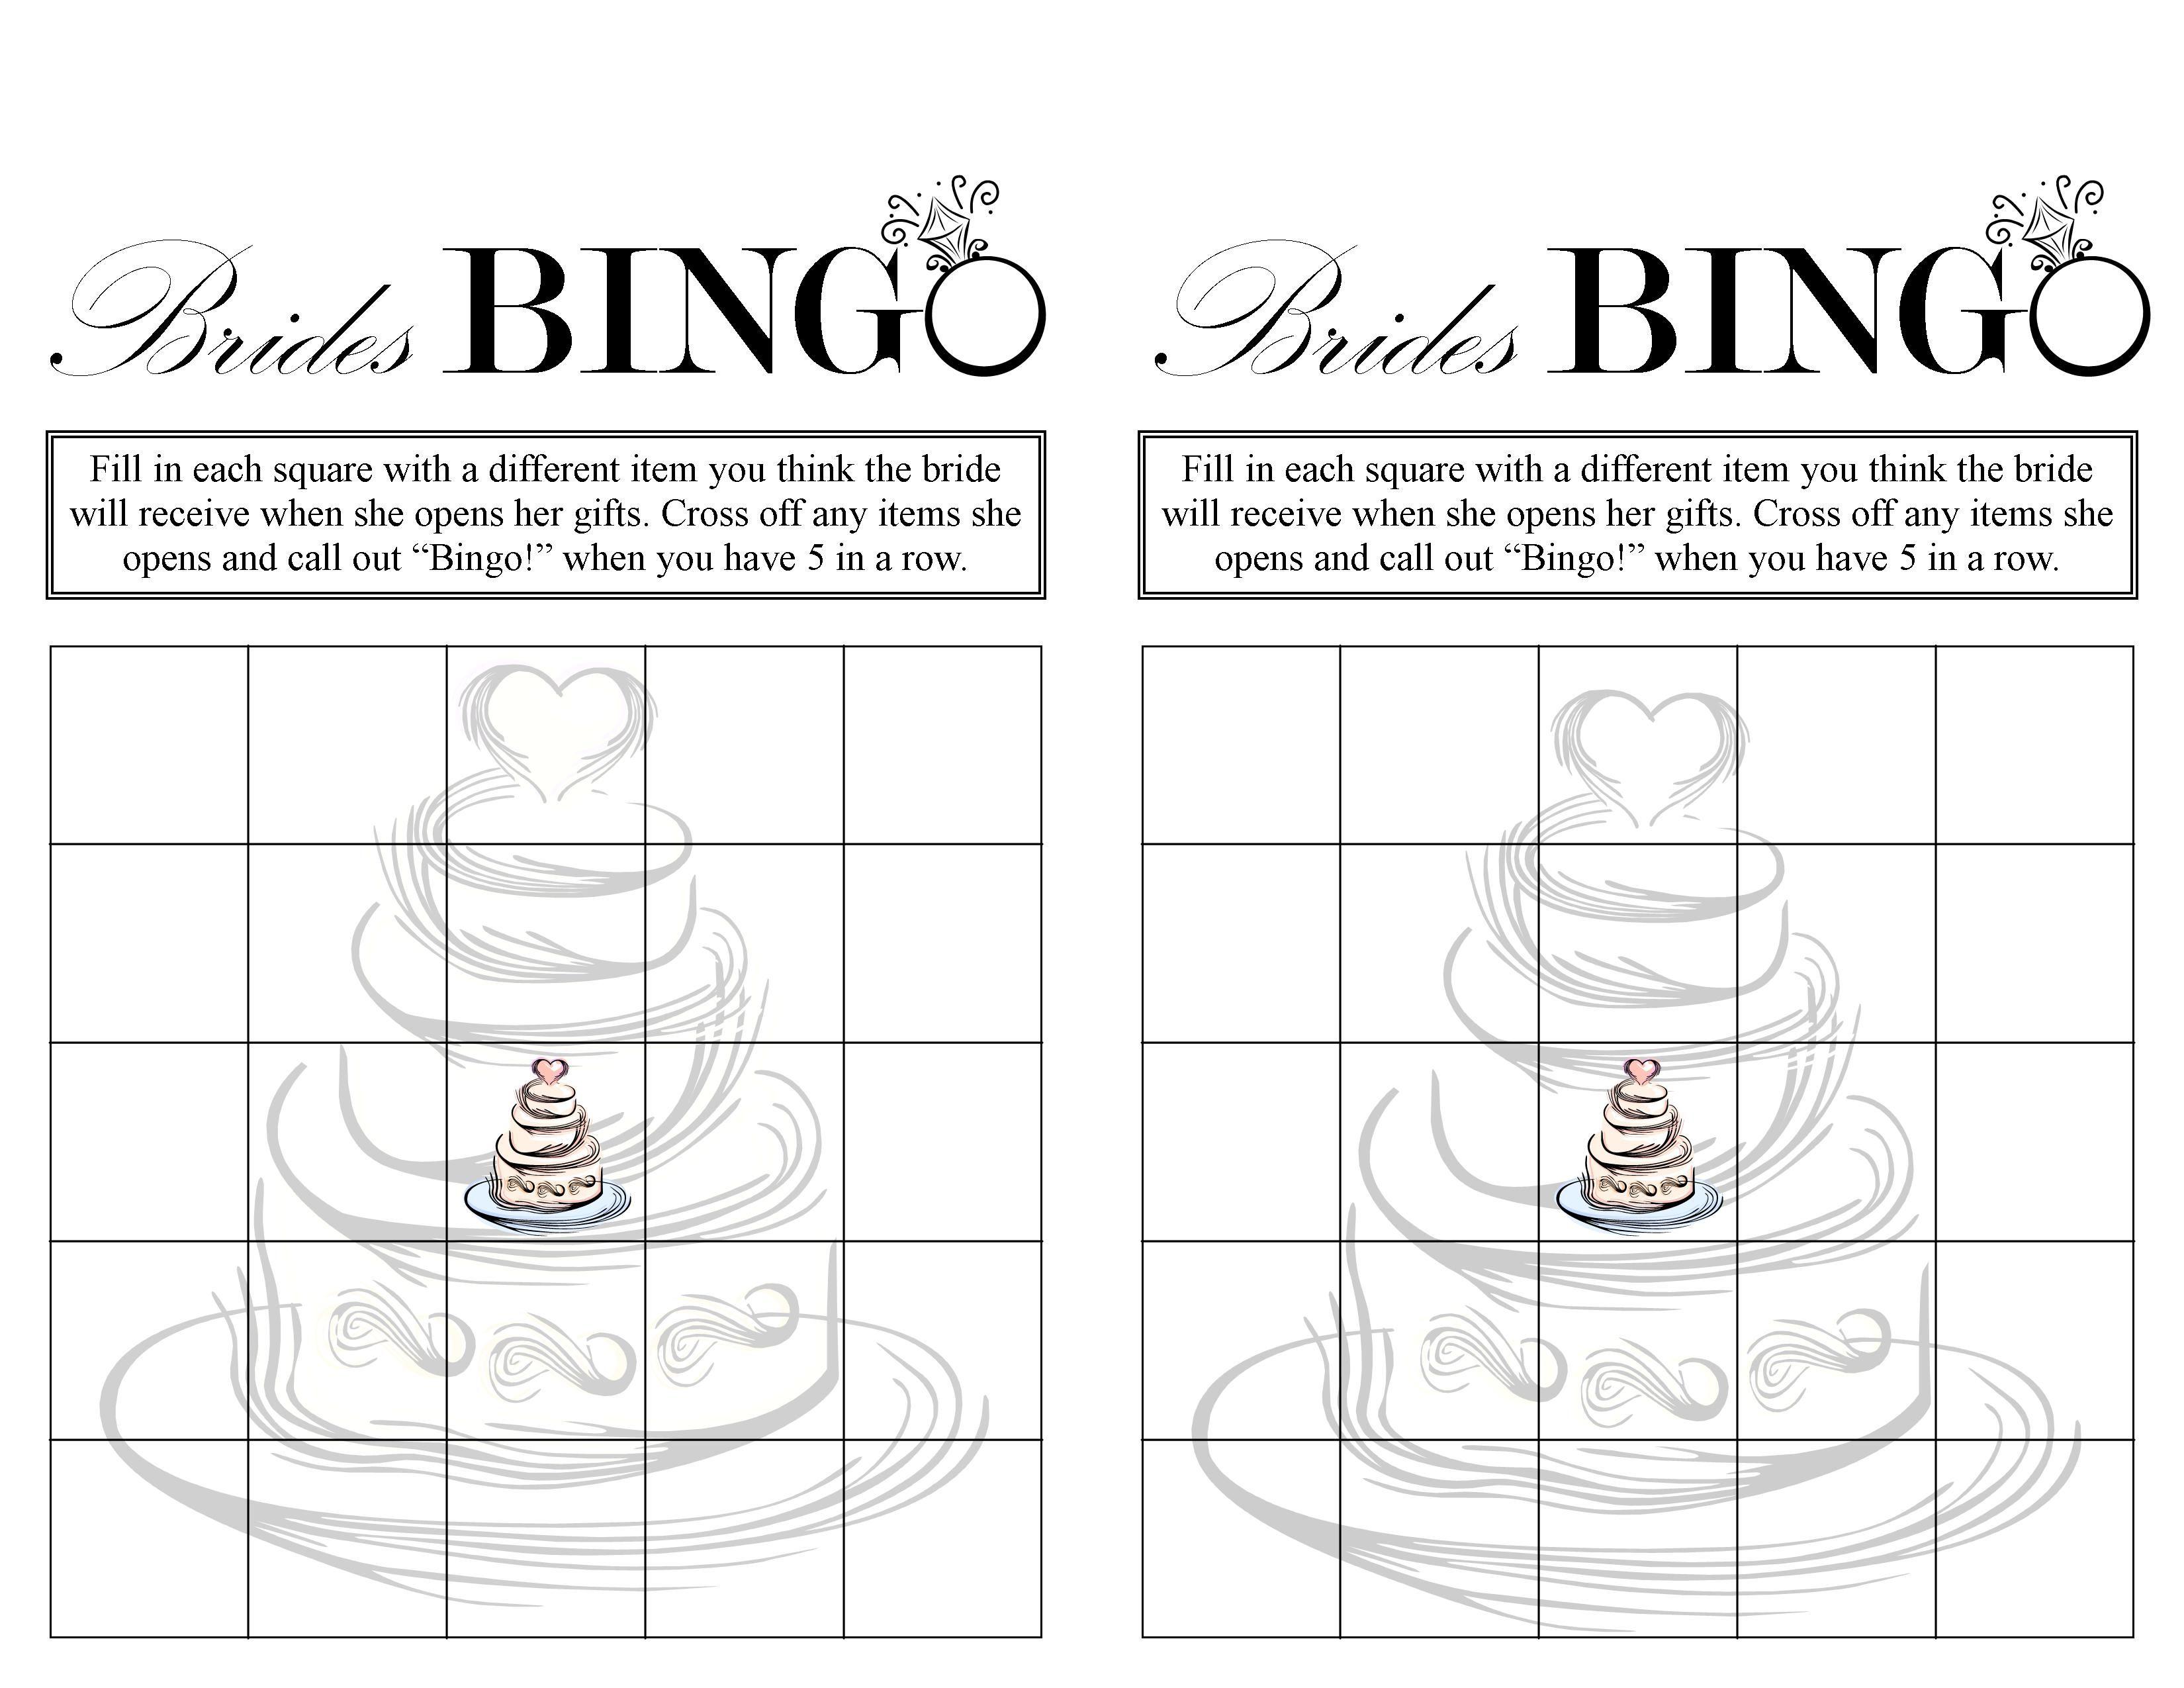 brides bingo | Tiff Shower/Bach Party | Pinterest | Bridal shower